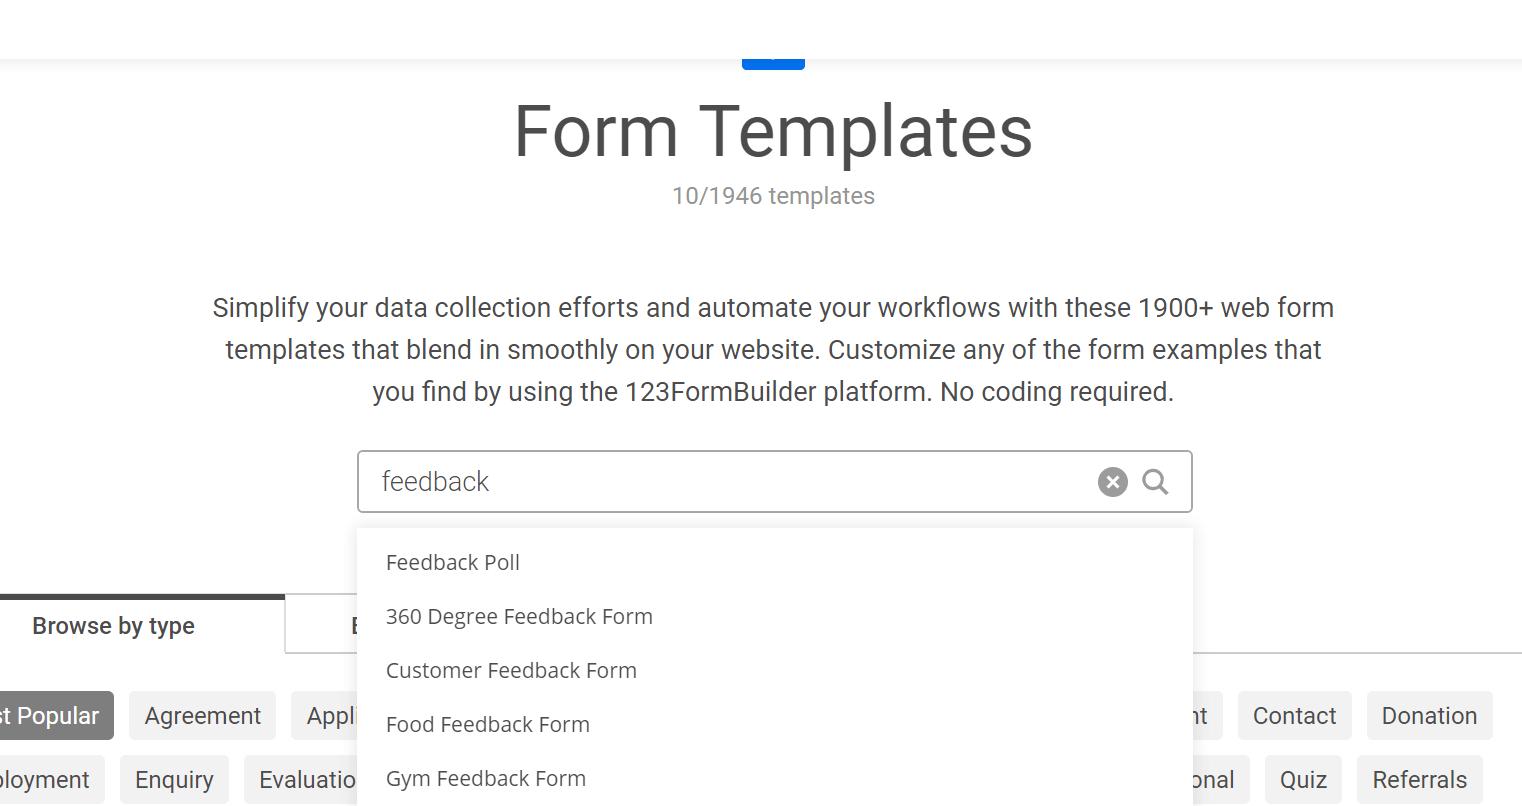 customer feedback templates on 123 form builder